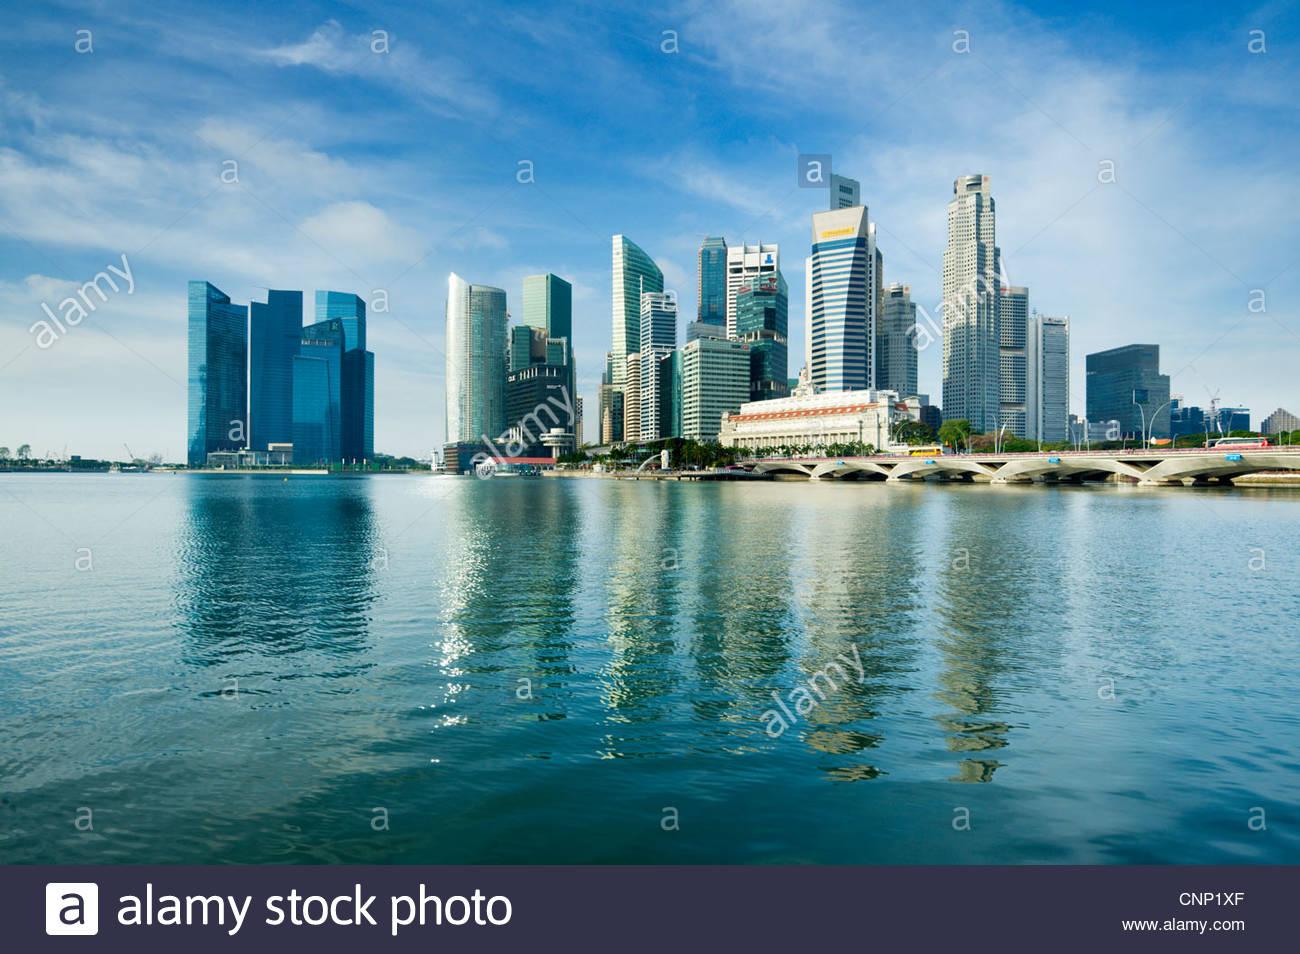 Der Central Business District, Singapur Stadt. Stockbild